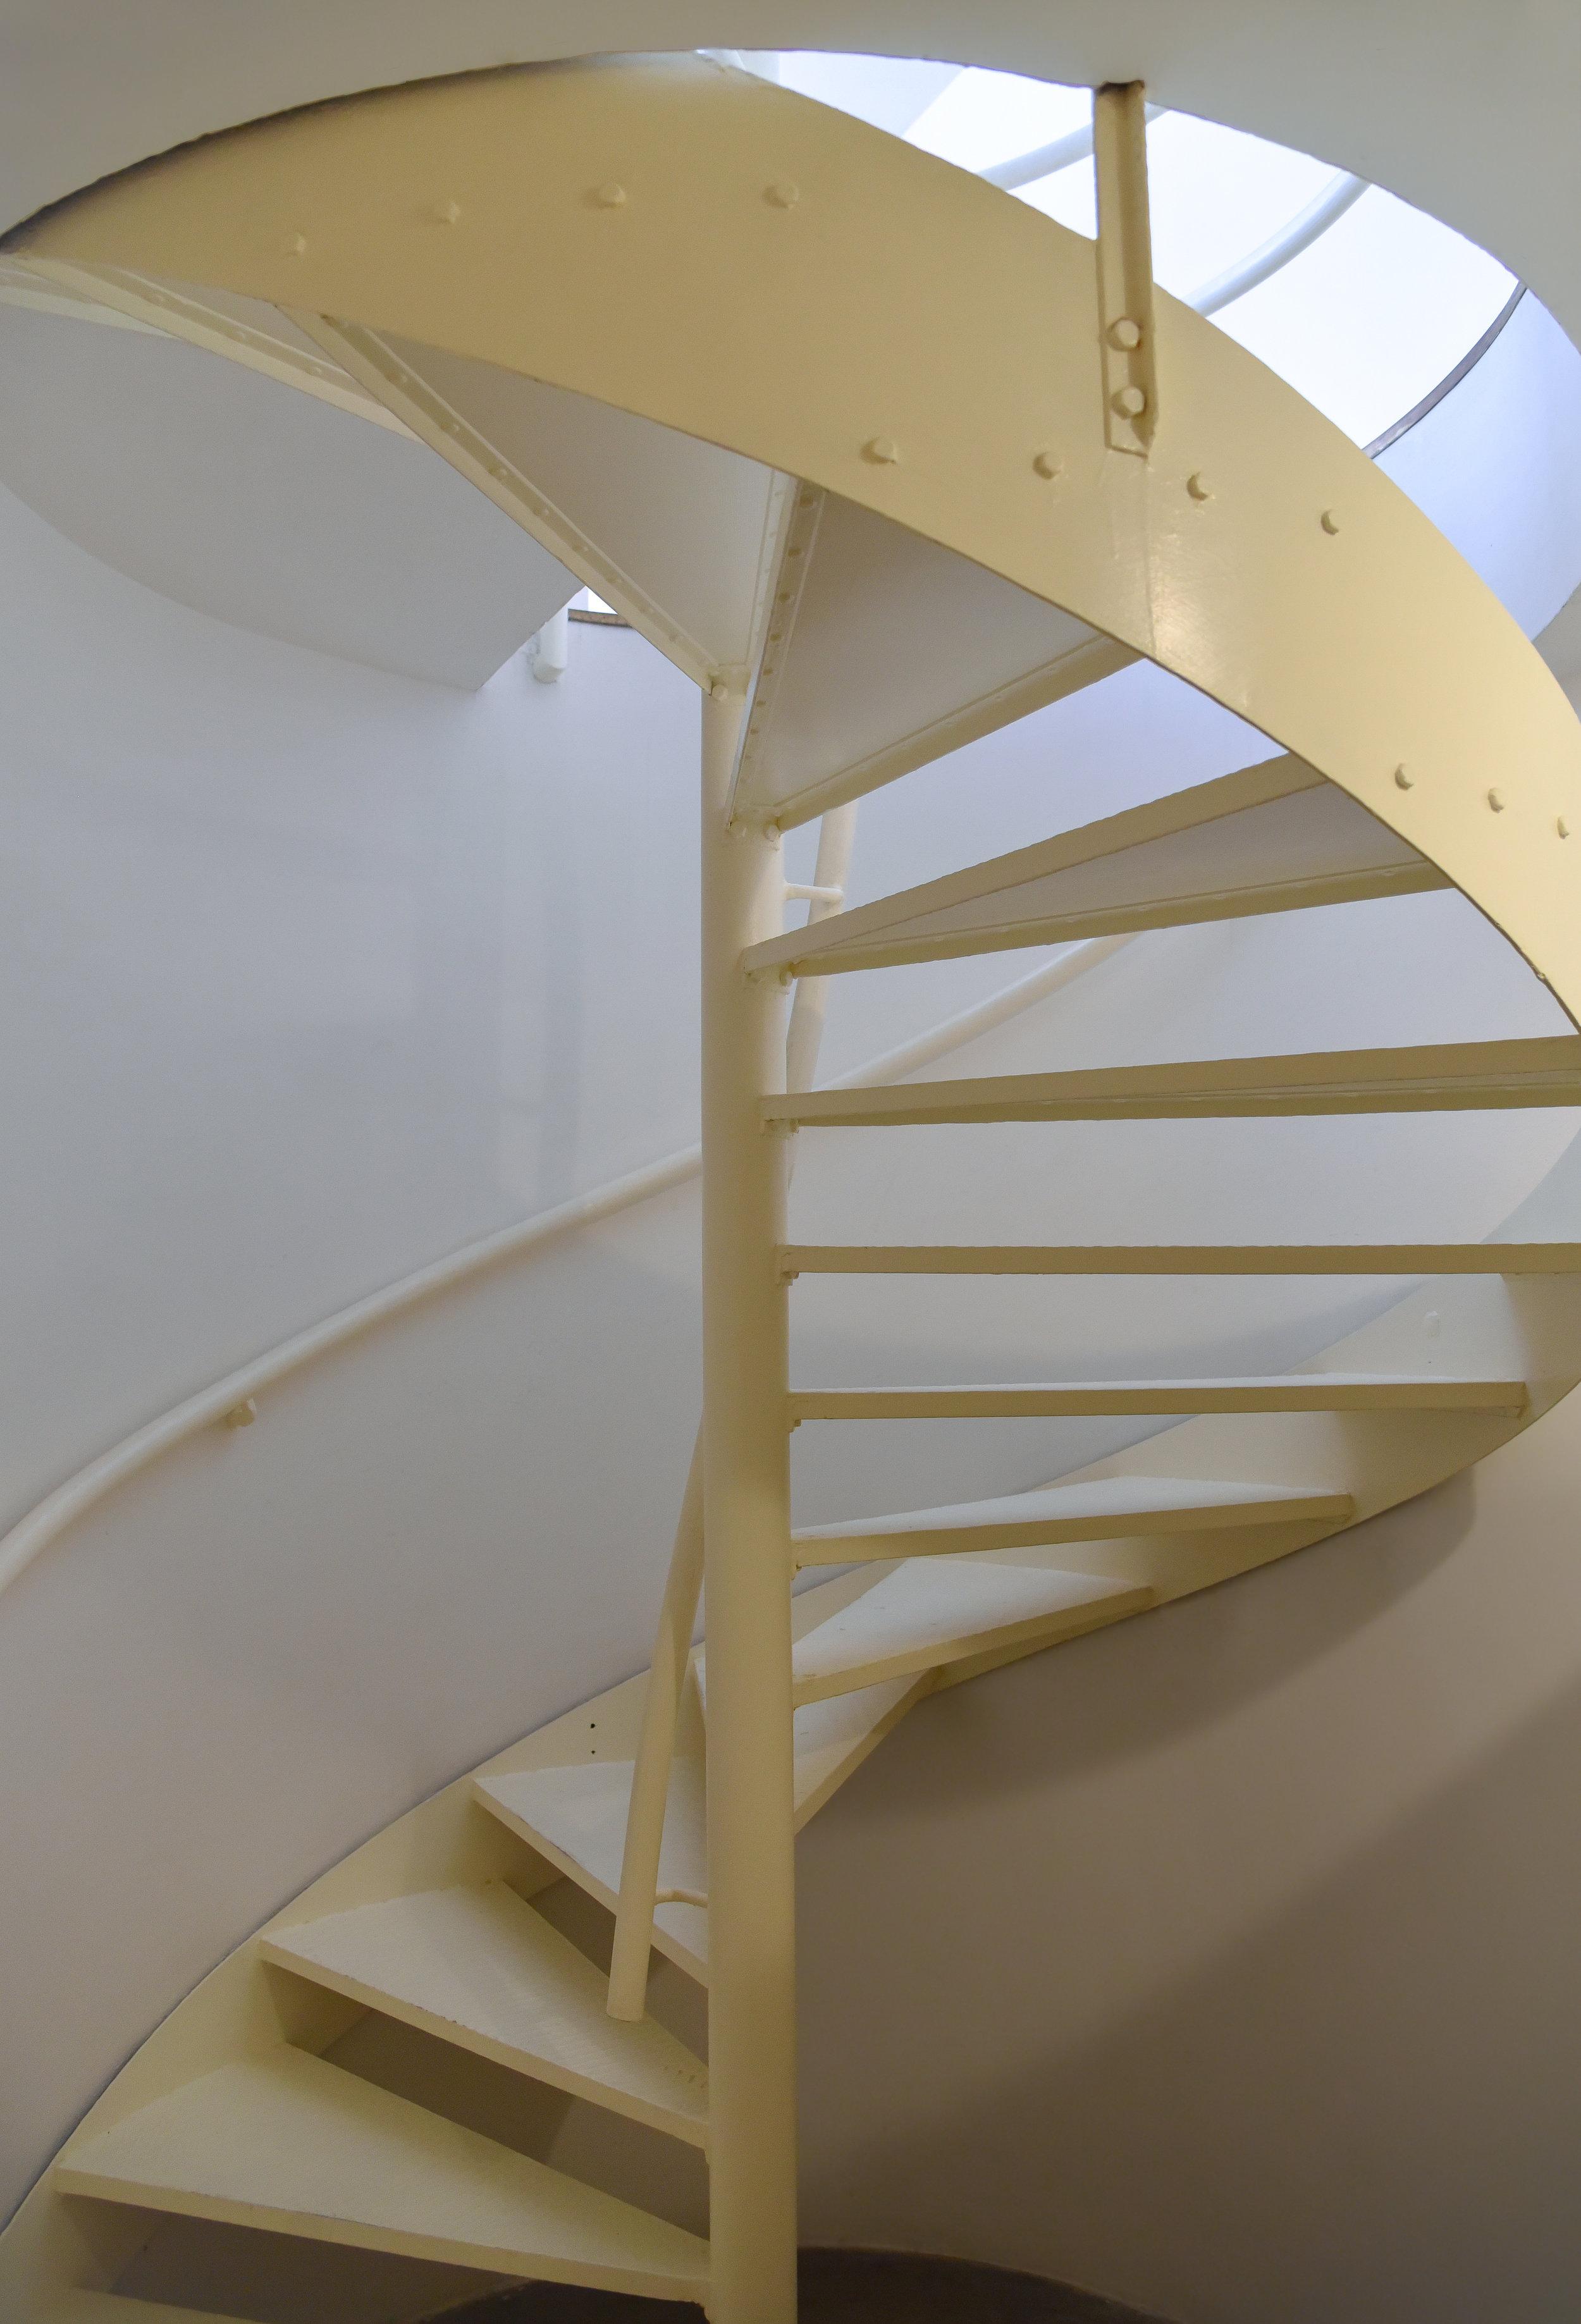 WINDING STEEL STAIRCASE